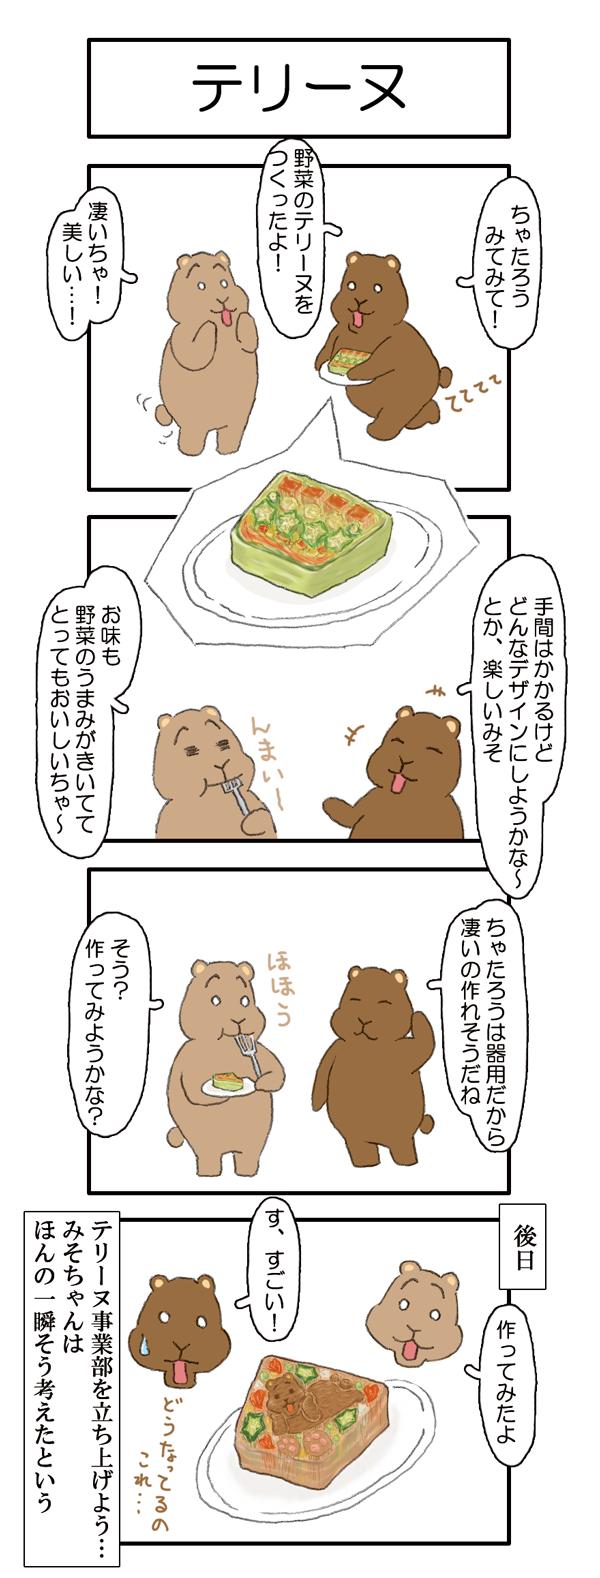 【081話】テリーヌ